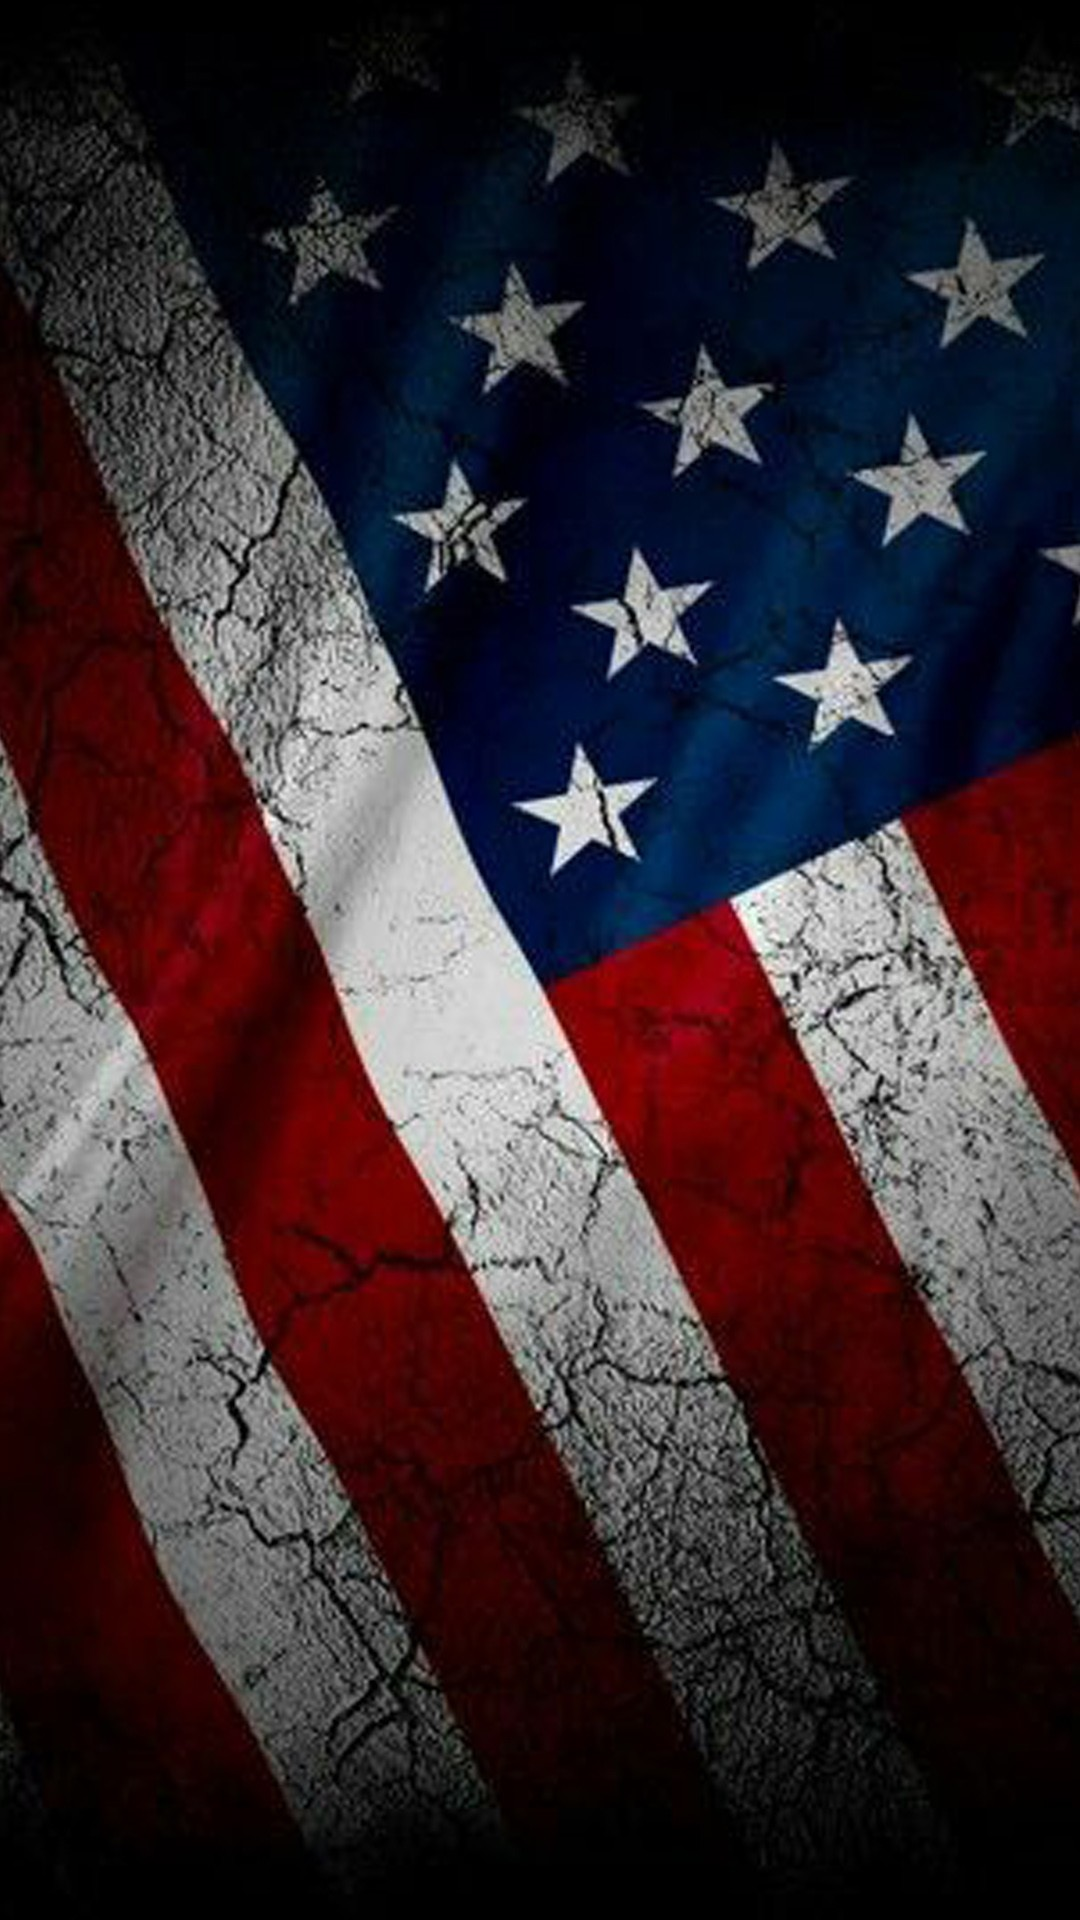 American Flag Iphone Wallpaper – American Flag wallpapers iphone se